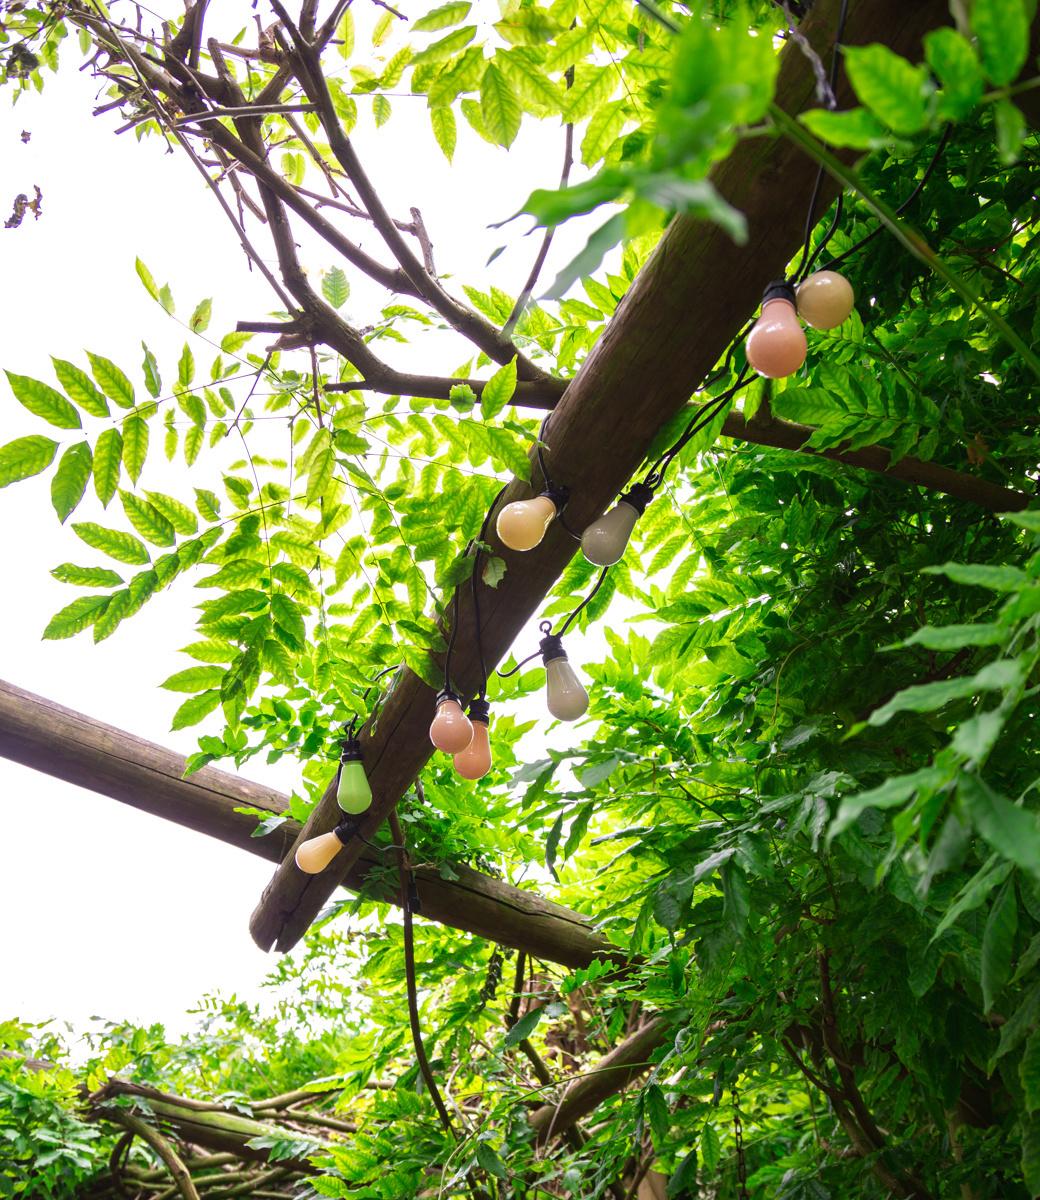 LEDR buiten feestverlichting groen en roze - Outdoor Patio Lichtslinger Paradise - 10 LED lampen - Edison Bulbs-5